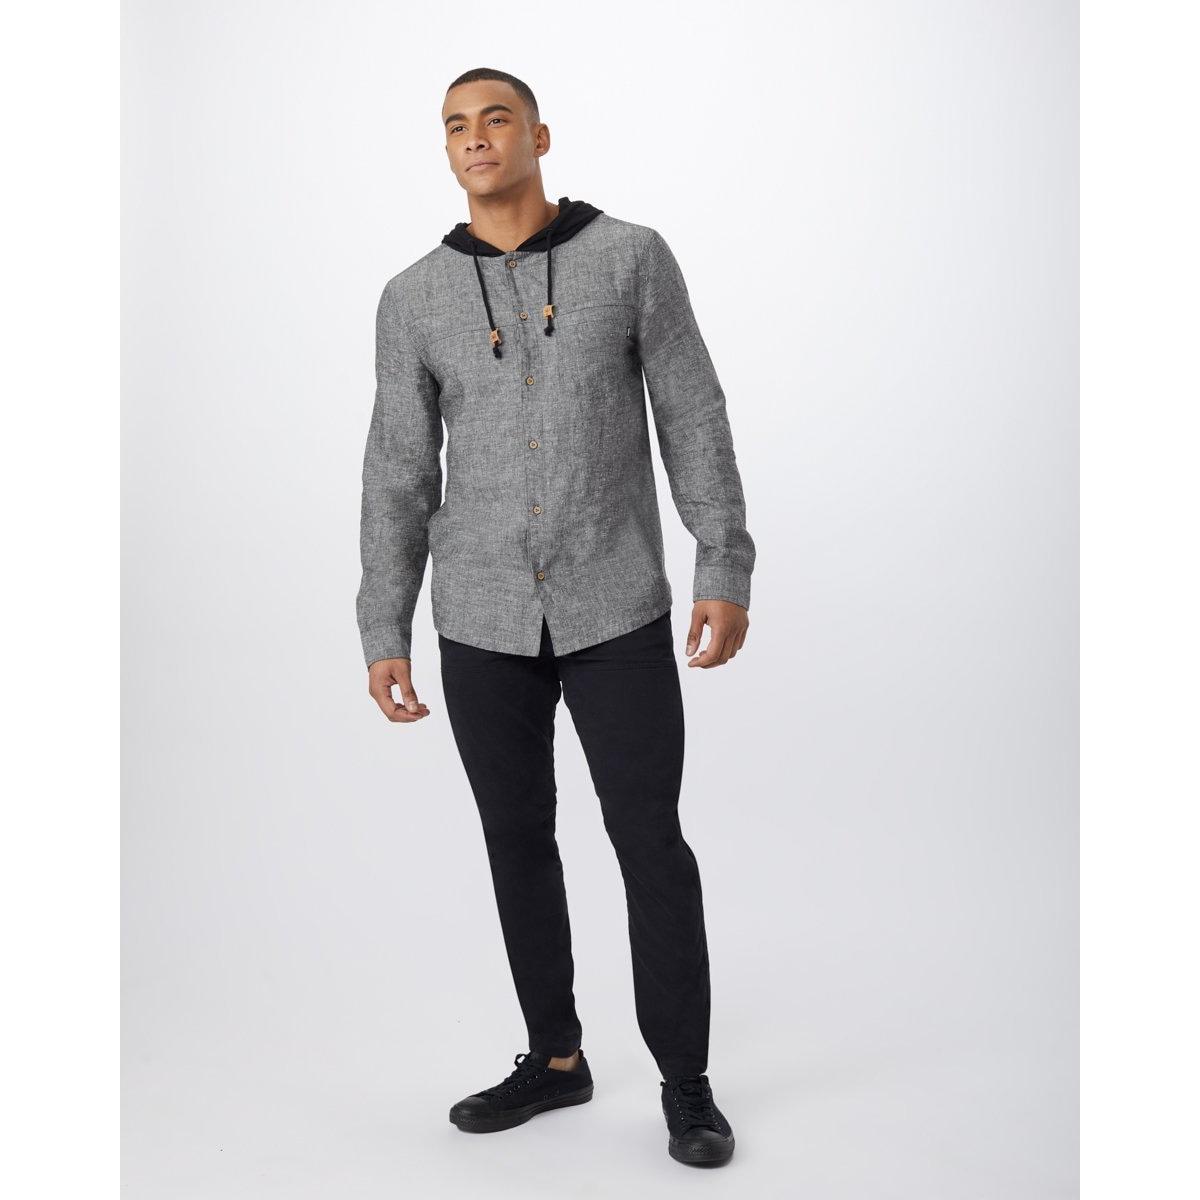 Mancos Button Up Long Sleeve Hoodie - Men's